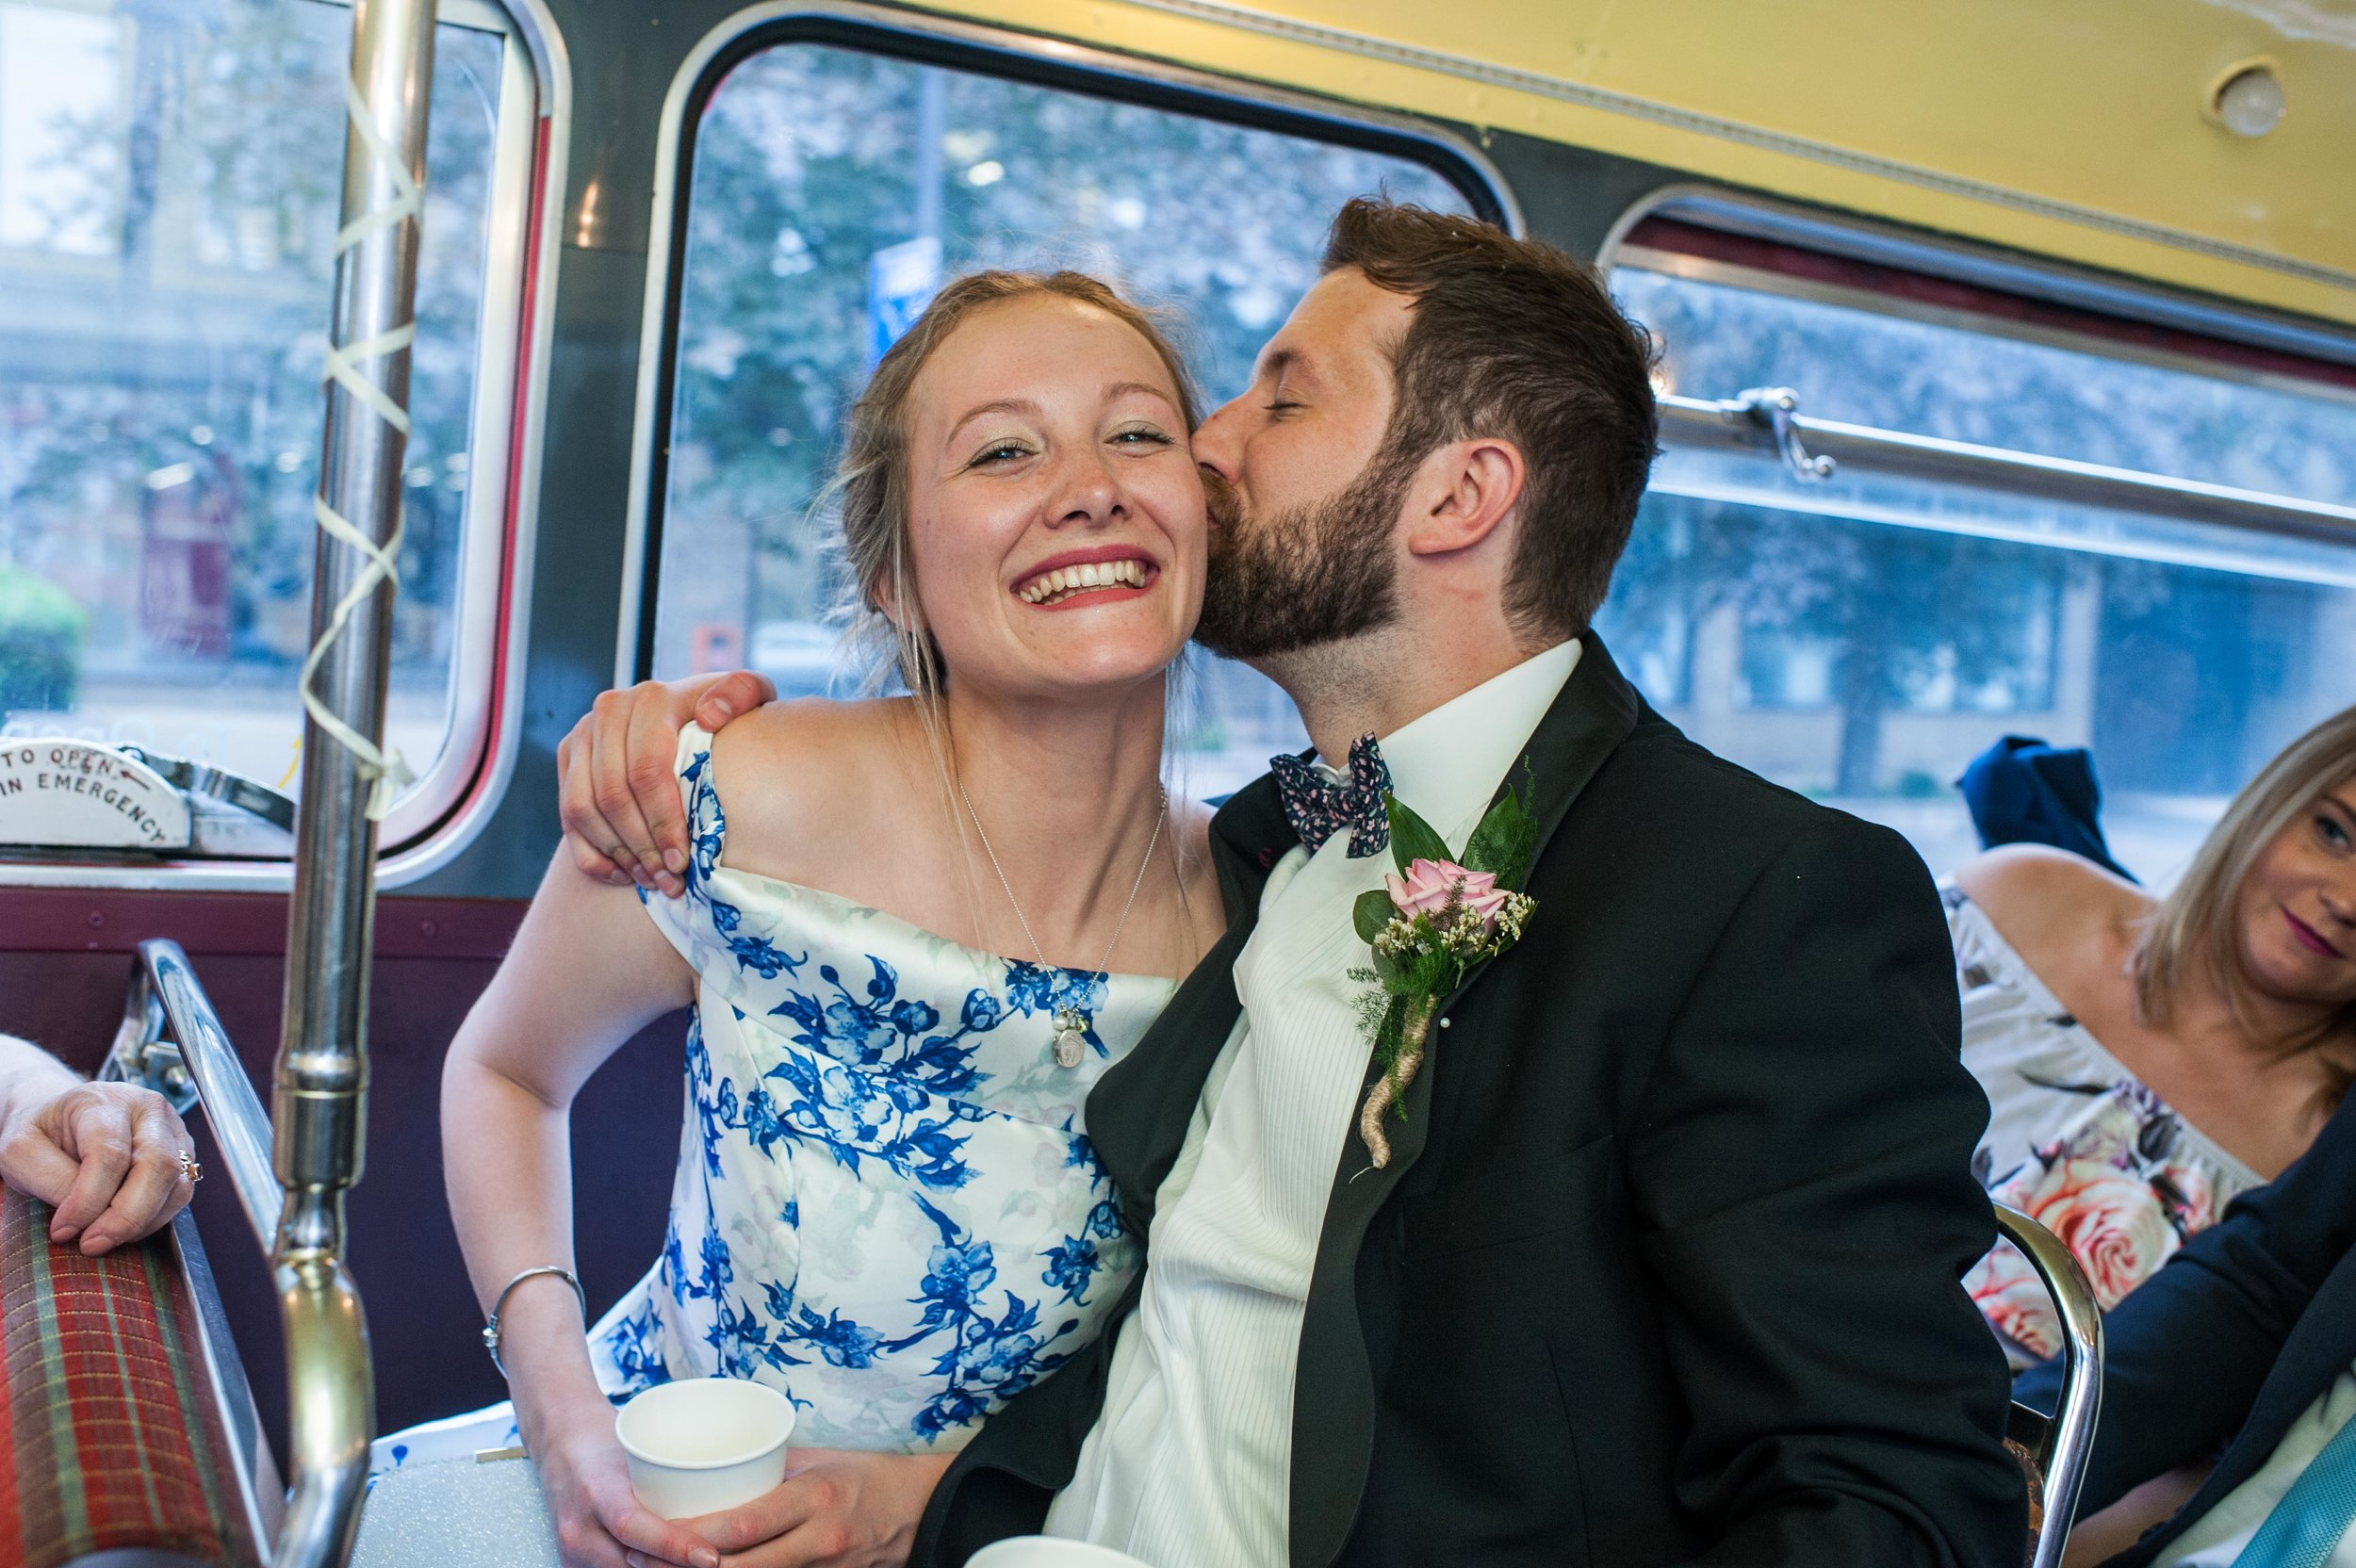 D&M_Marylebone Town Hall Wedding (182 of 239).jpg